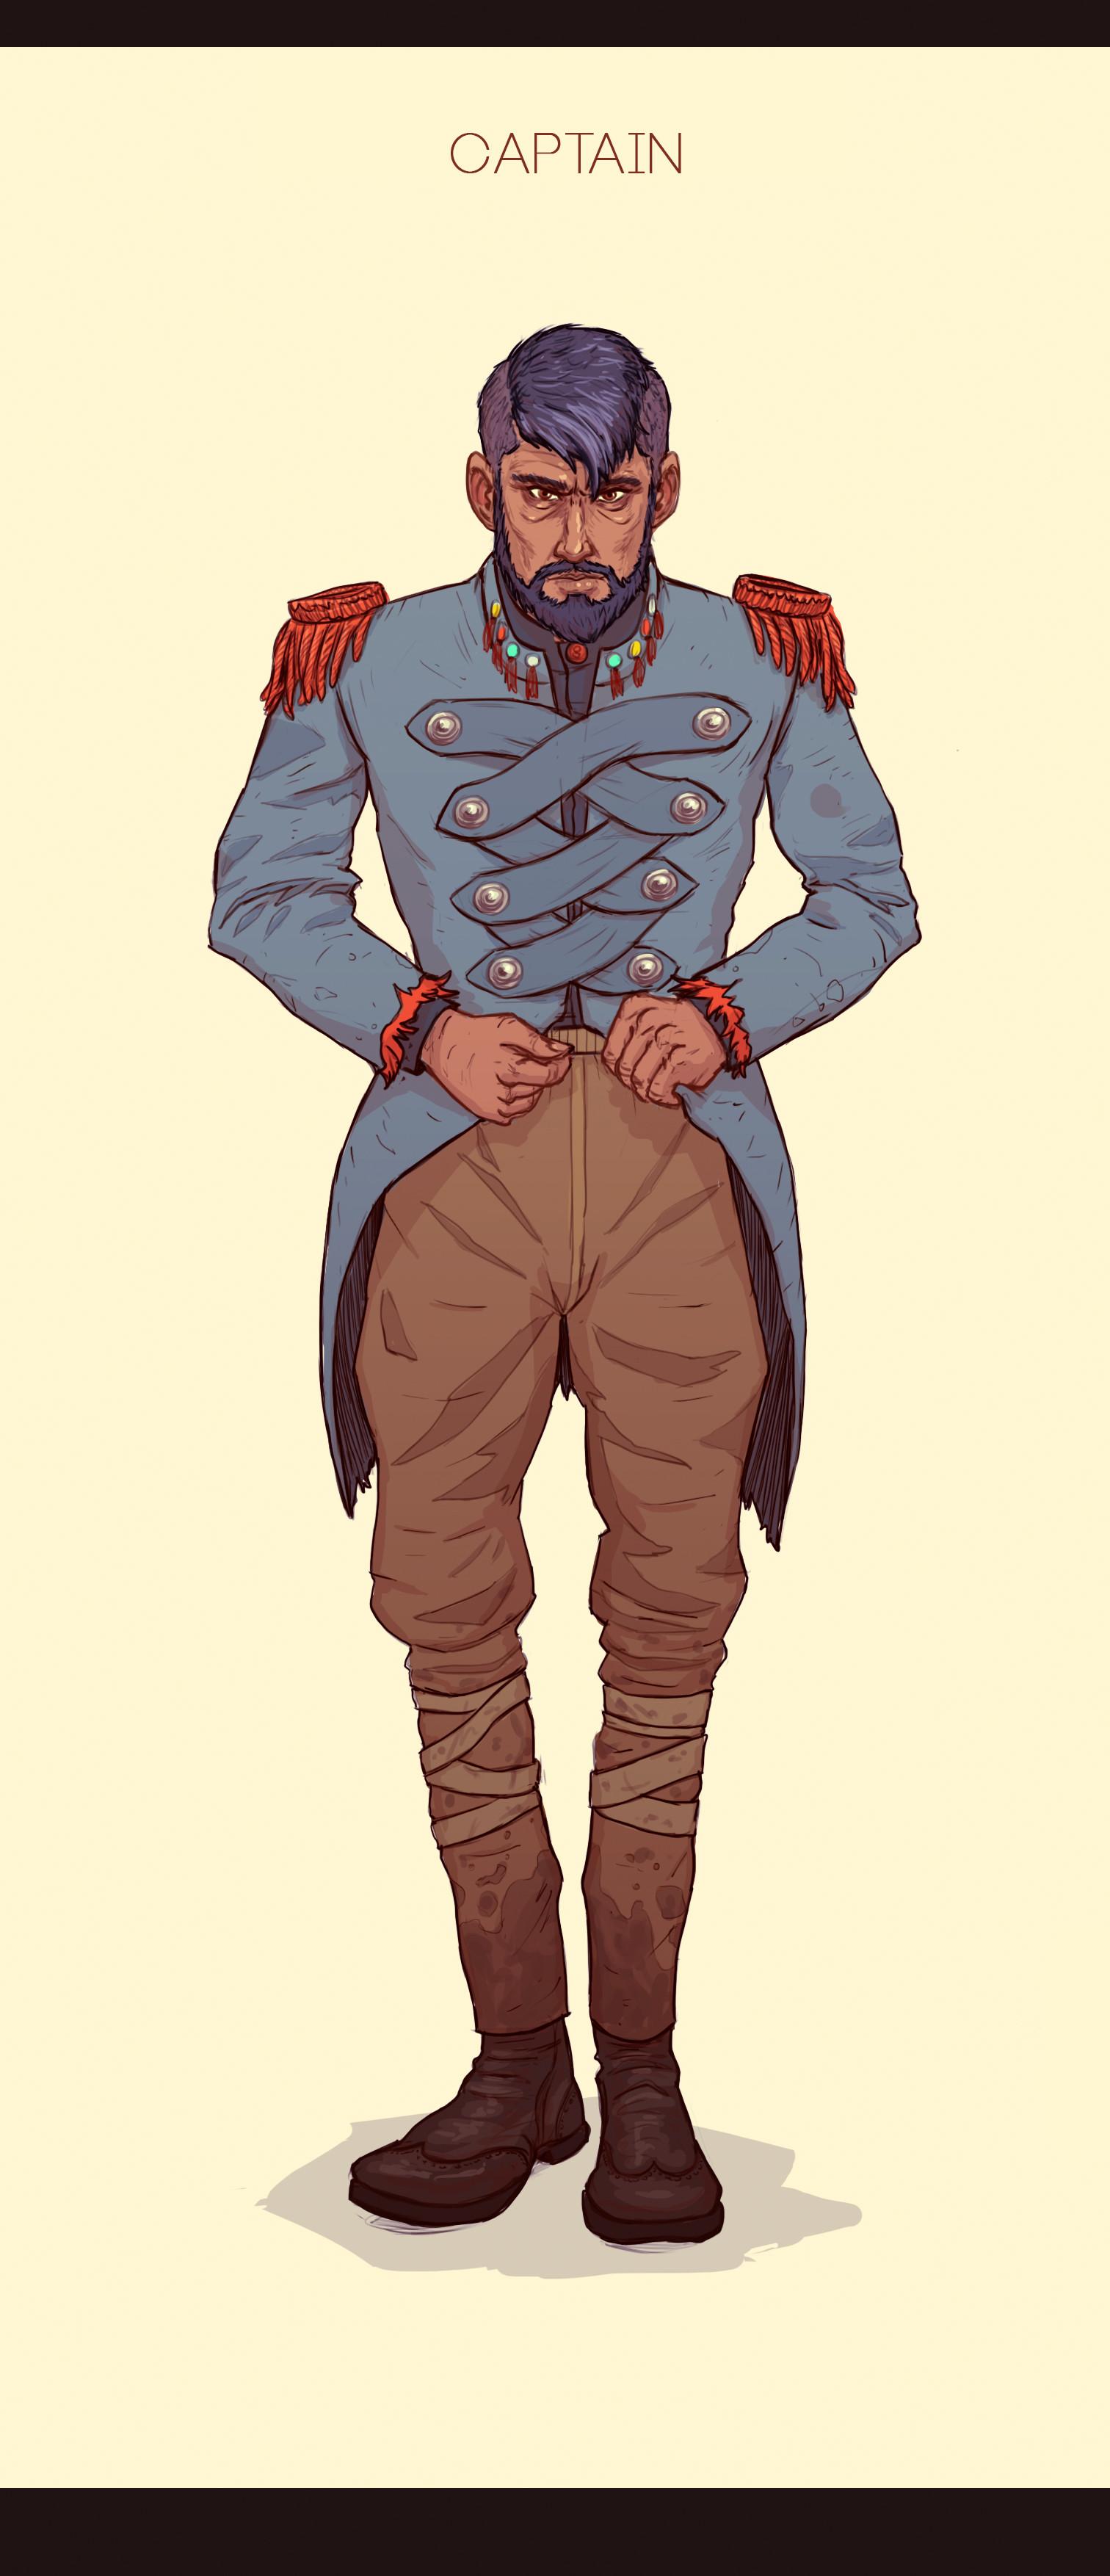 Jean philippe hugonnet captain